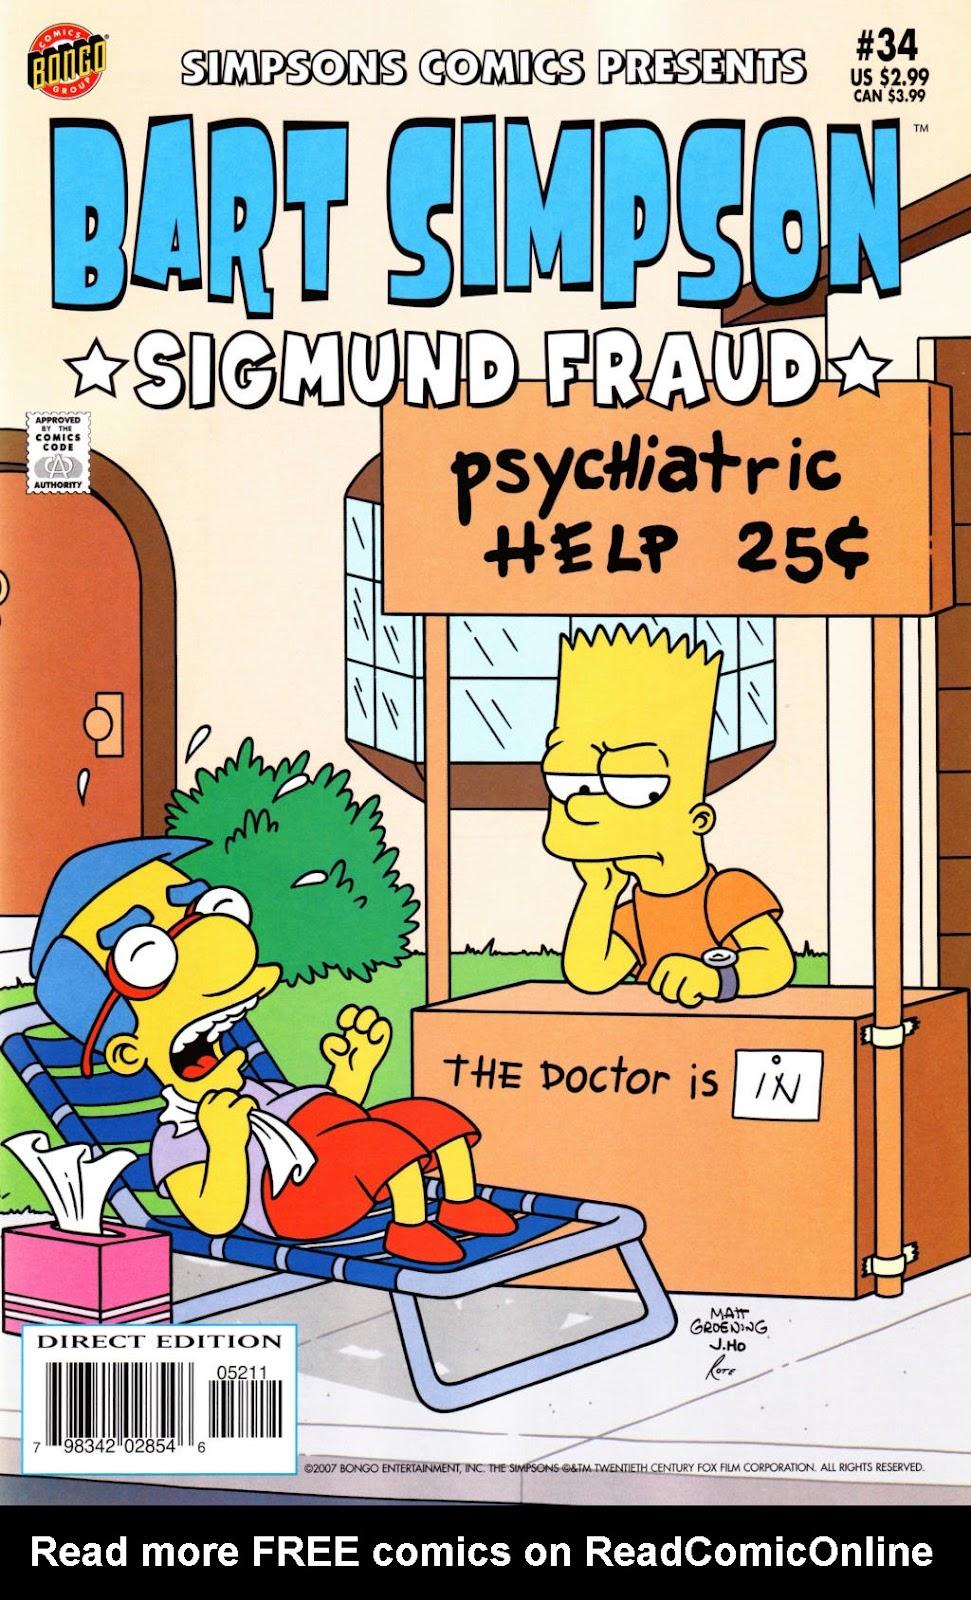 Simpsons Comics Presents Bart Simpson 34 Page 1